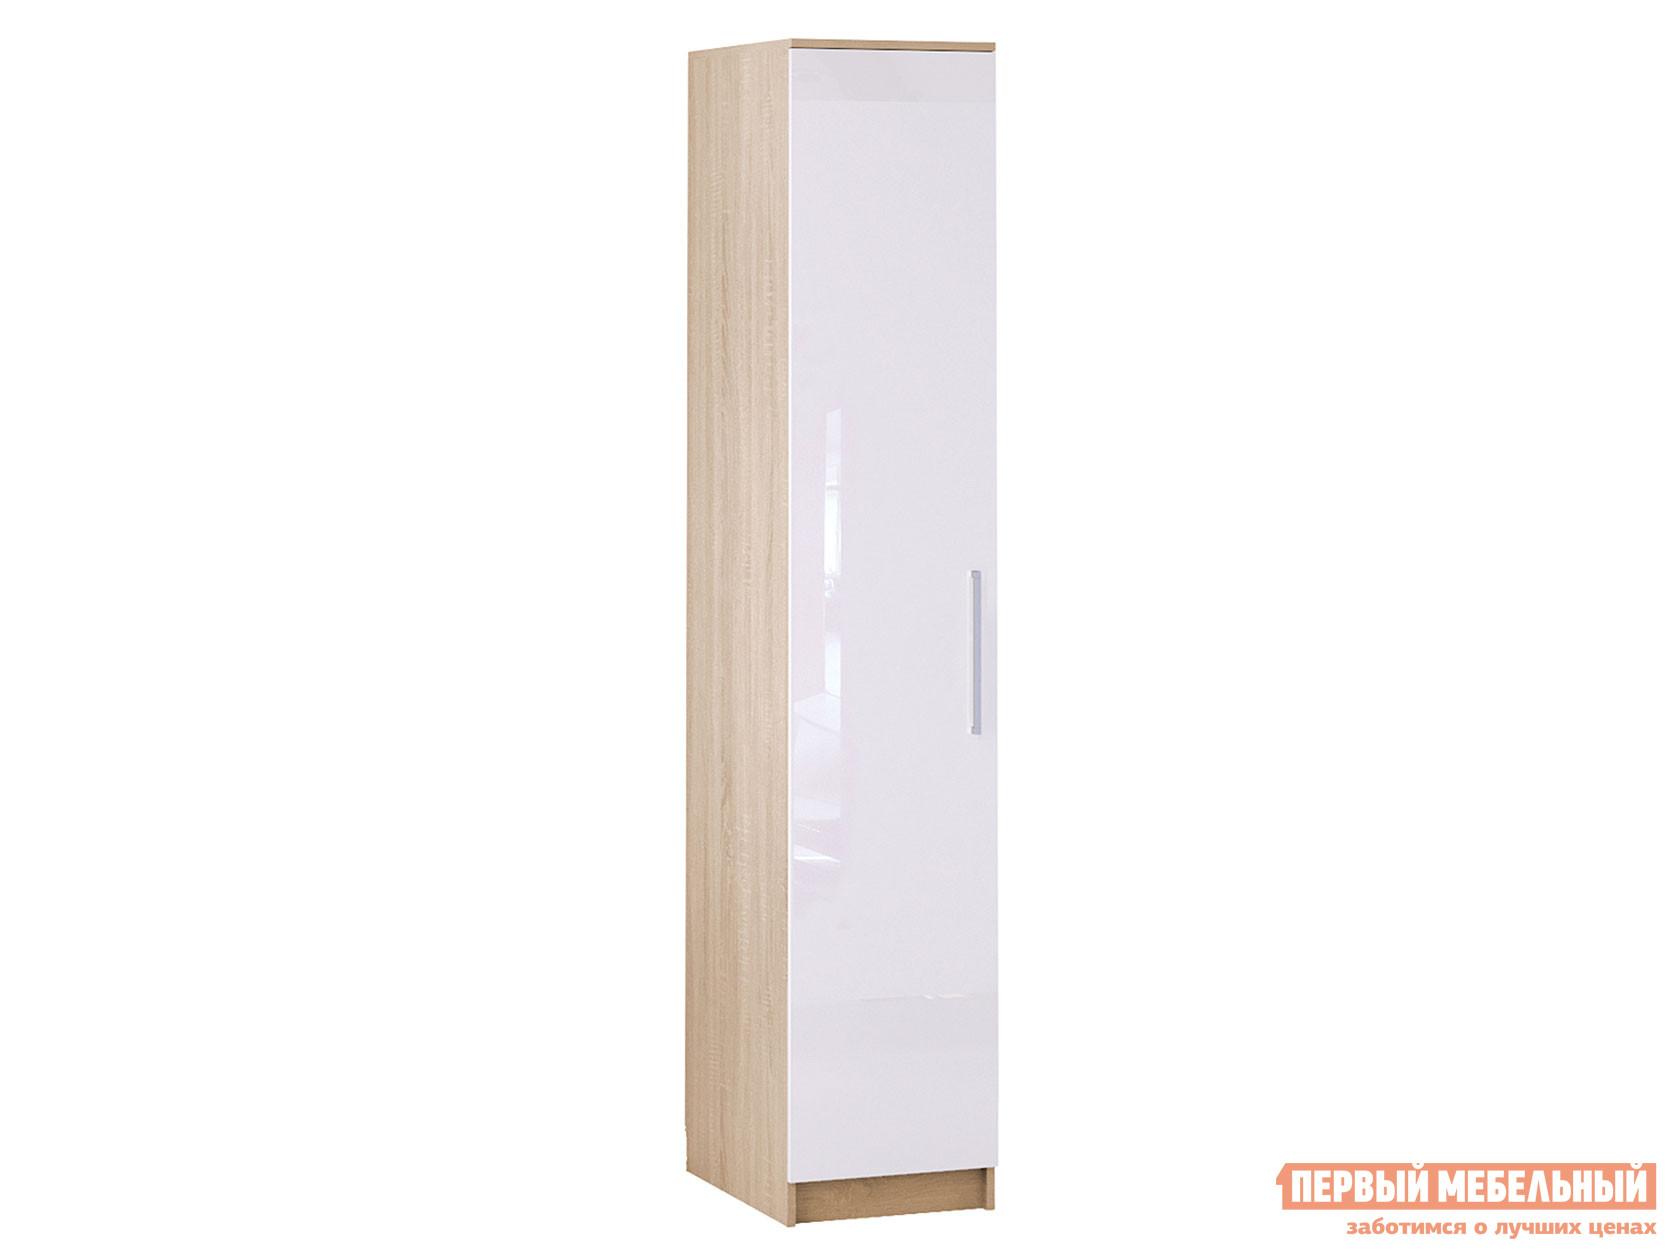 Шкаф-пенал НК-Мебель Бланка шкаф однодверный 72250077